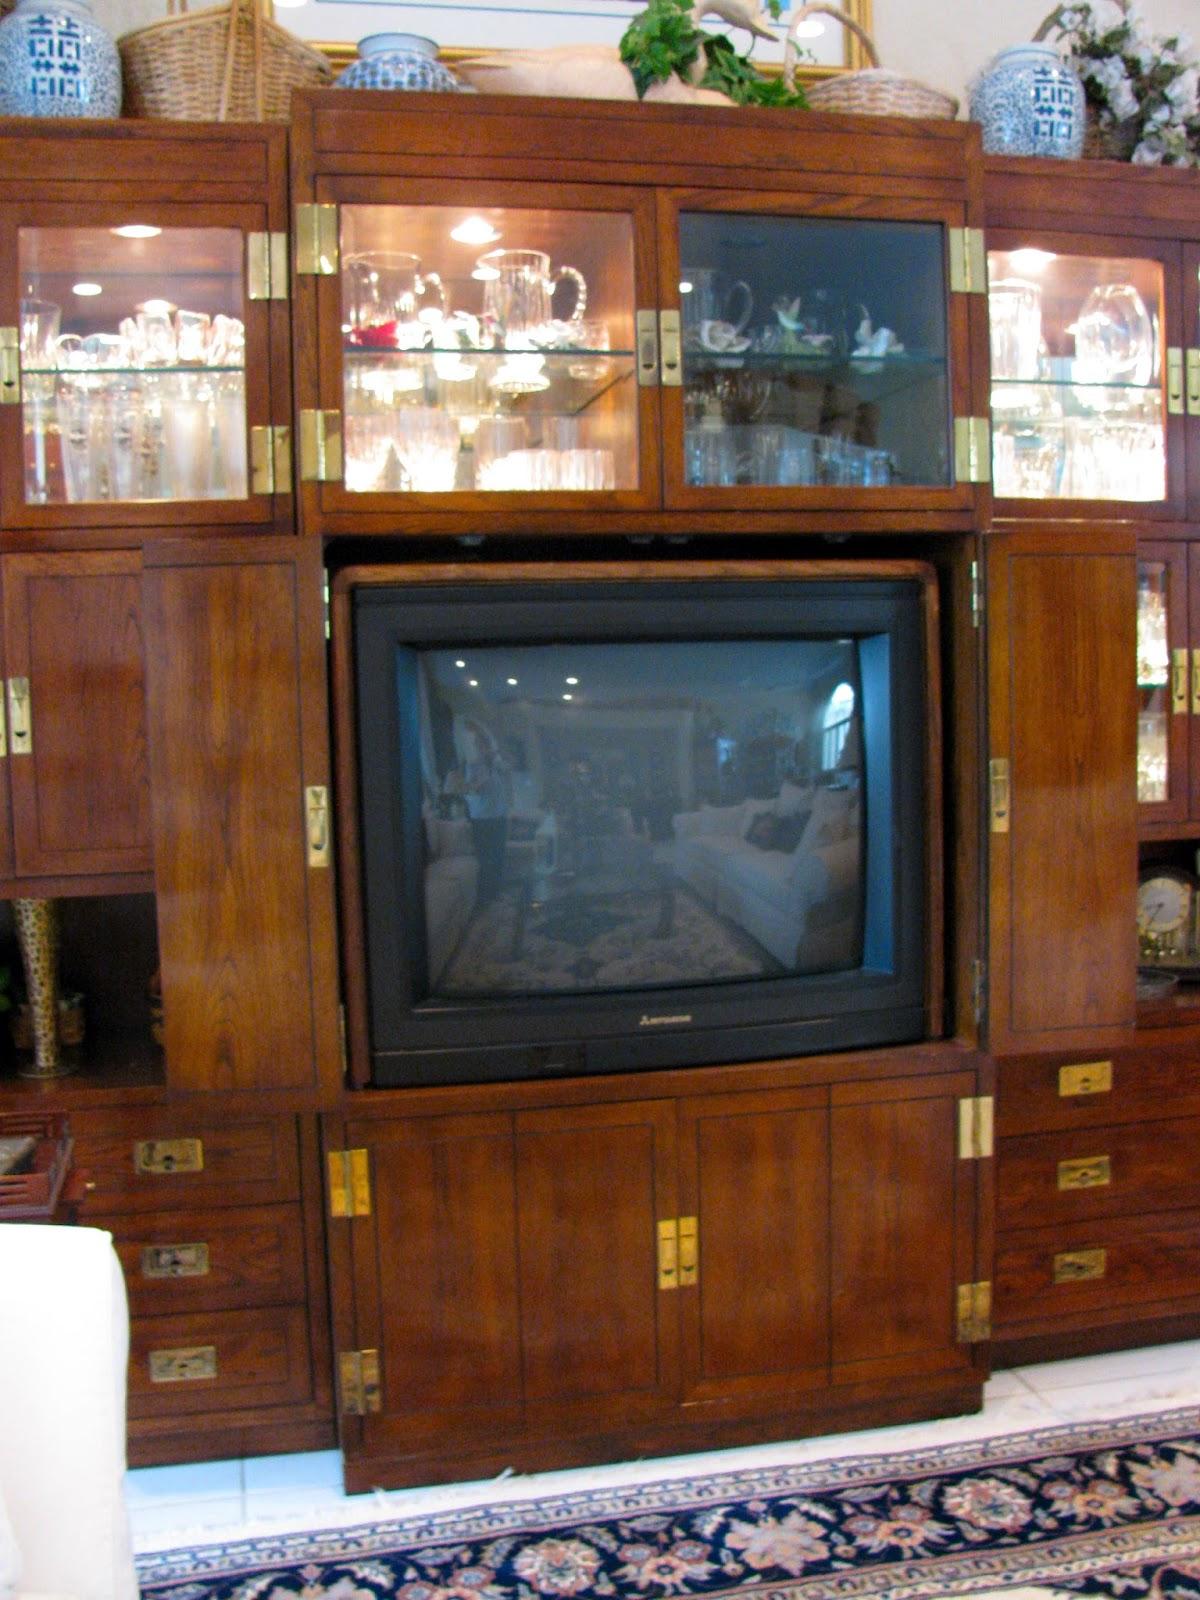 100 50 tv armoire repurposed tv armoire into a kitchen